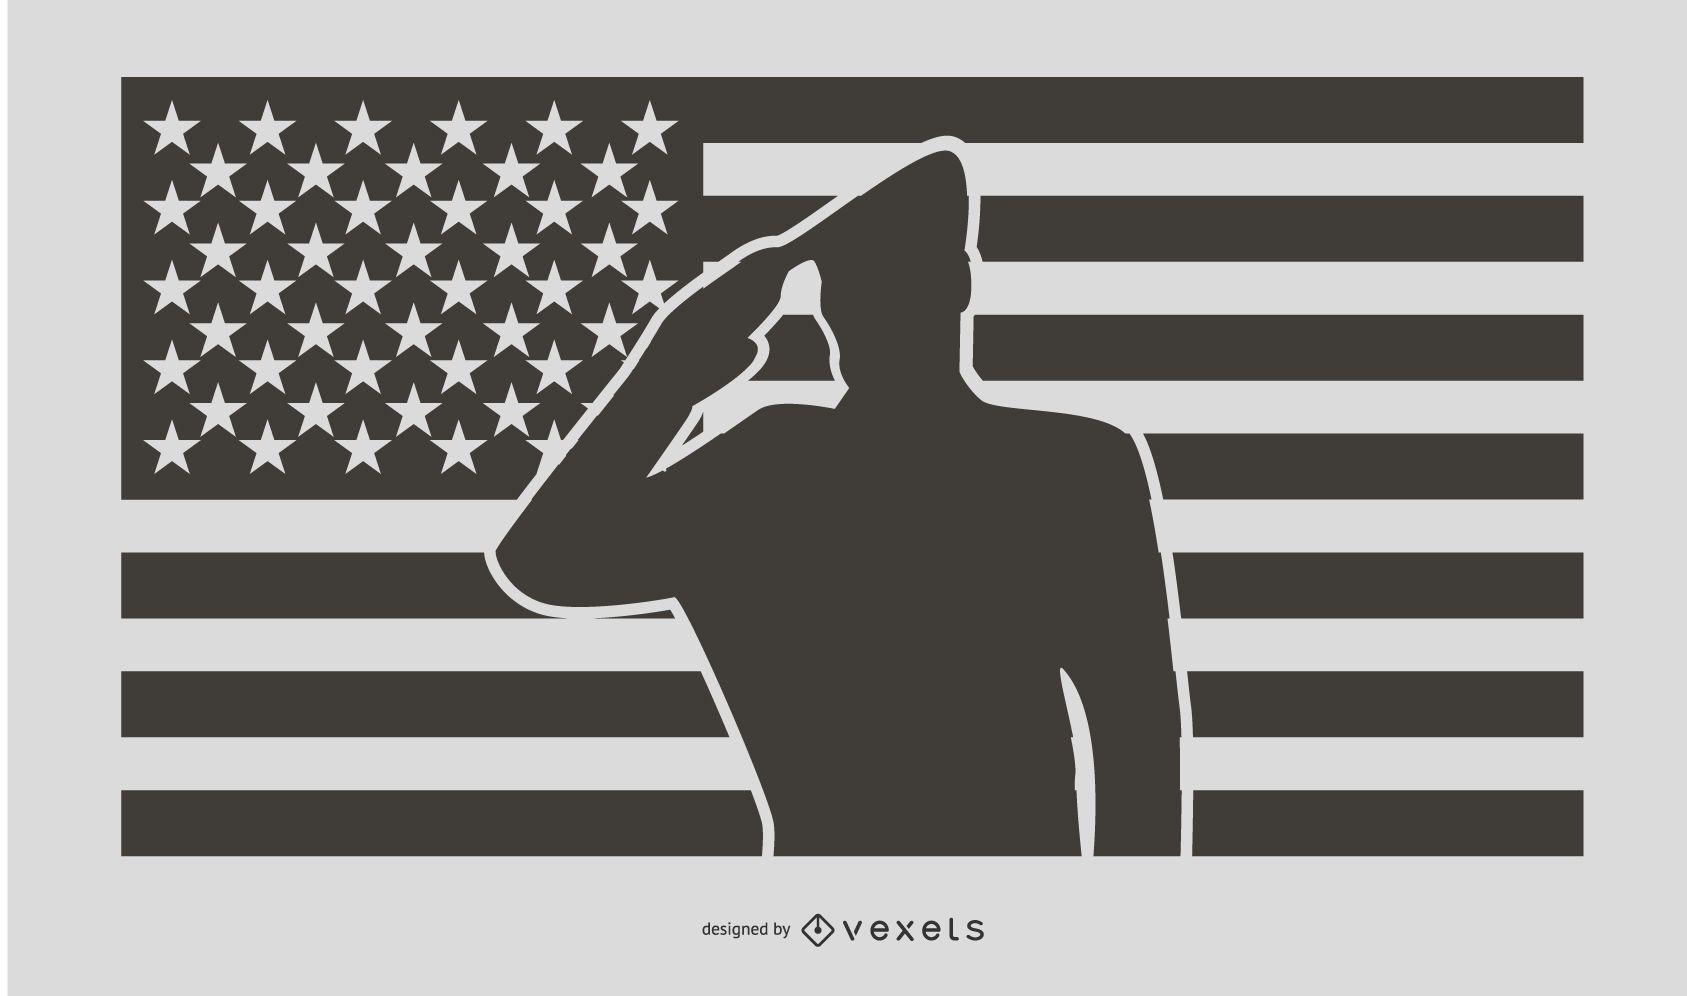 Diseño de silueta de saludo militar